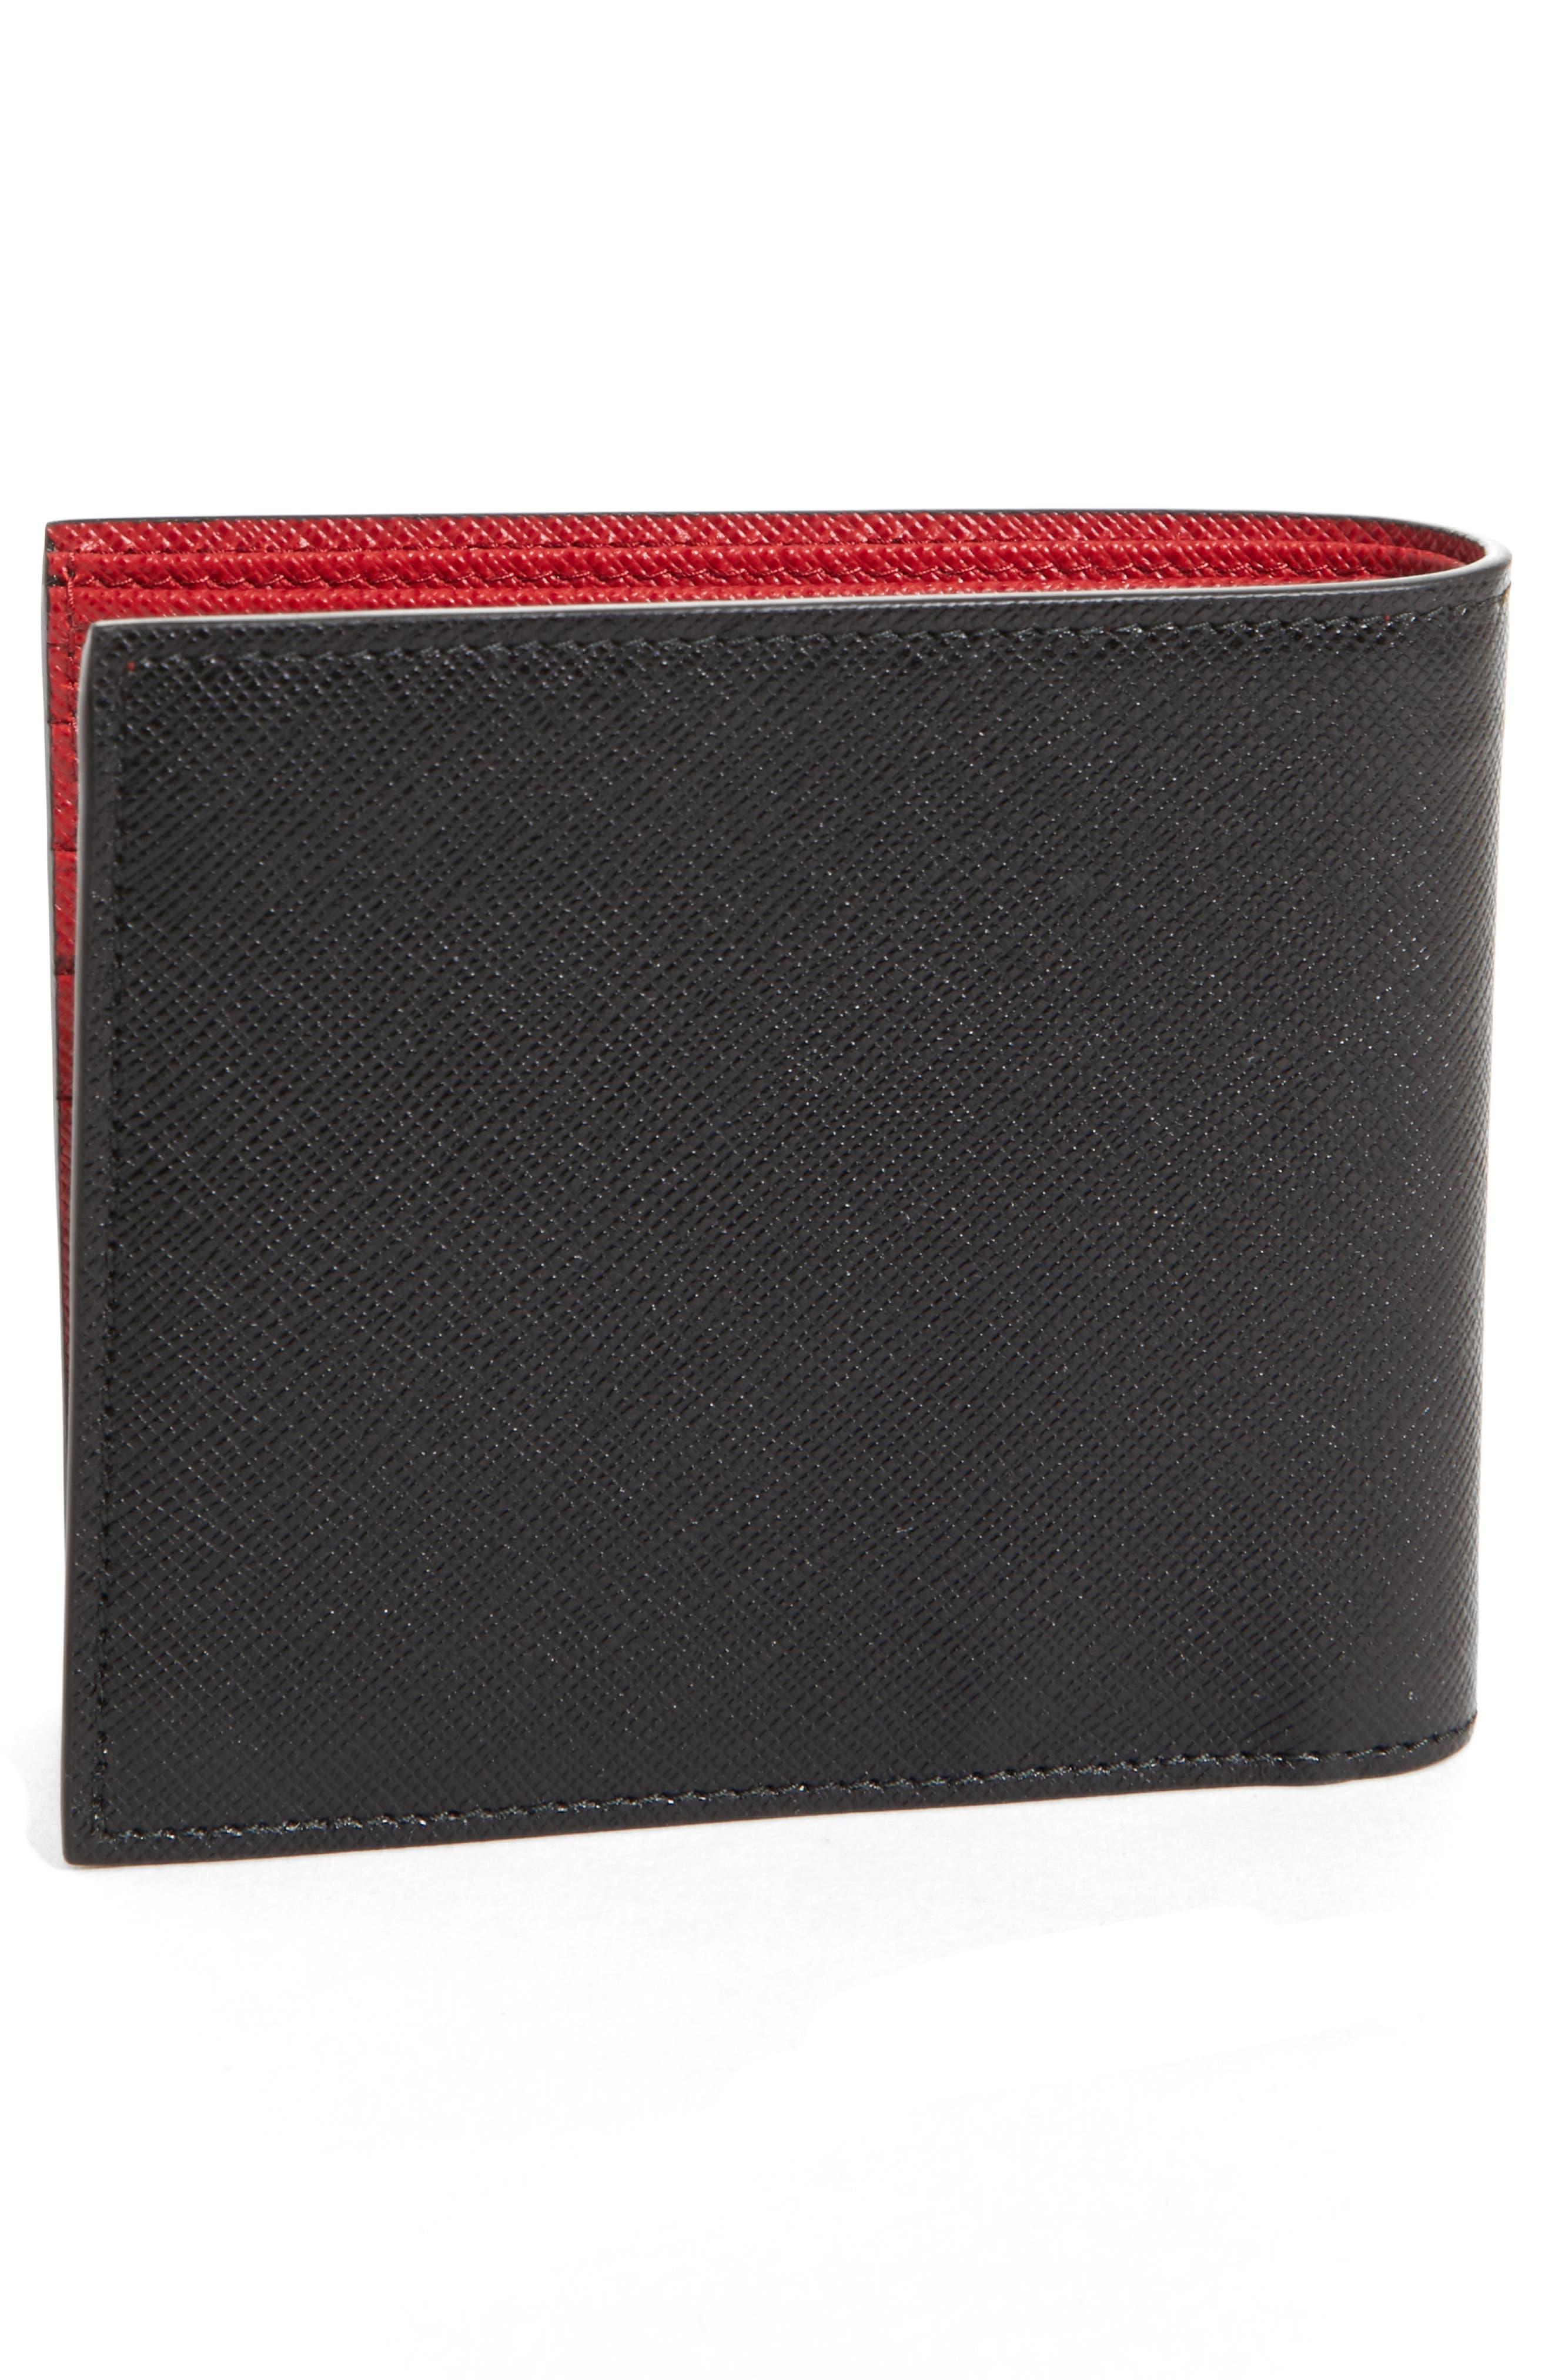 Bicolor Leather Wallet,                             Alternate thumbnail 3, color,                             001